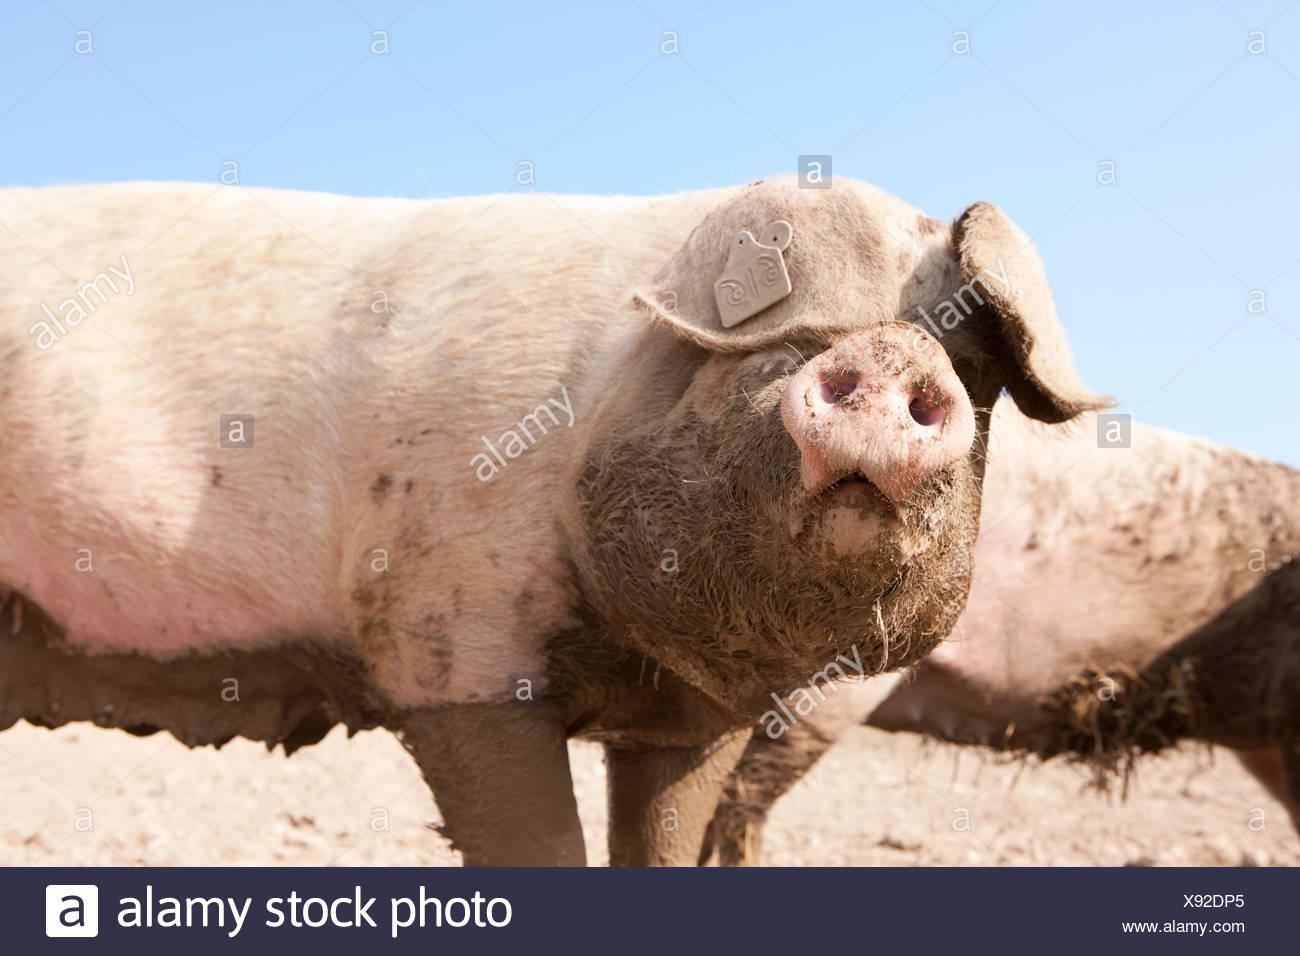 Muddy pig - Stock Image